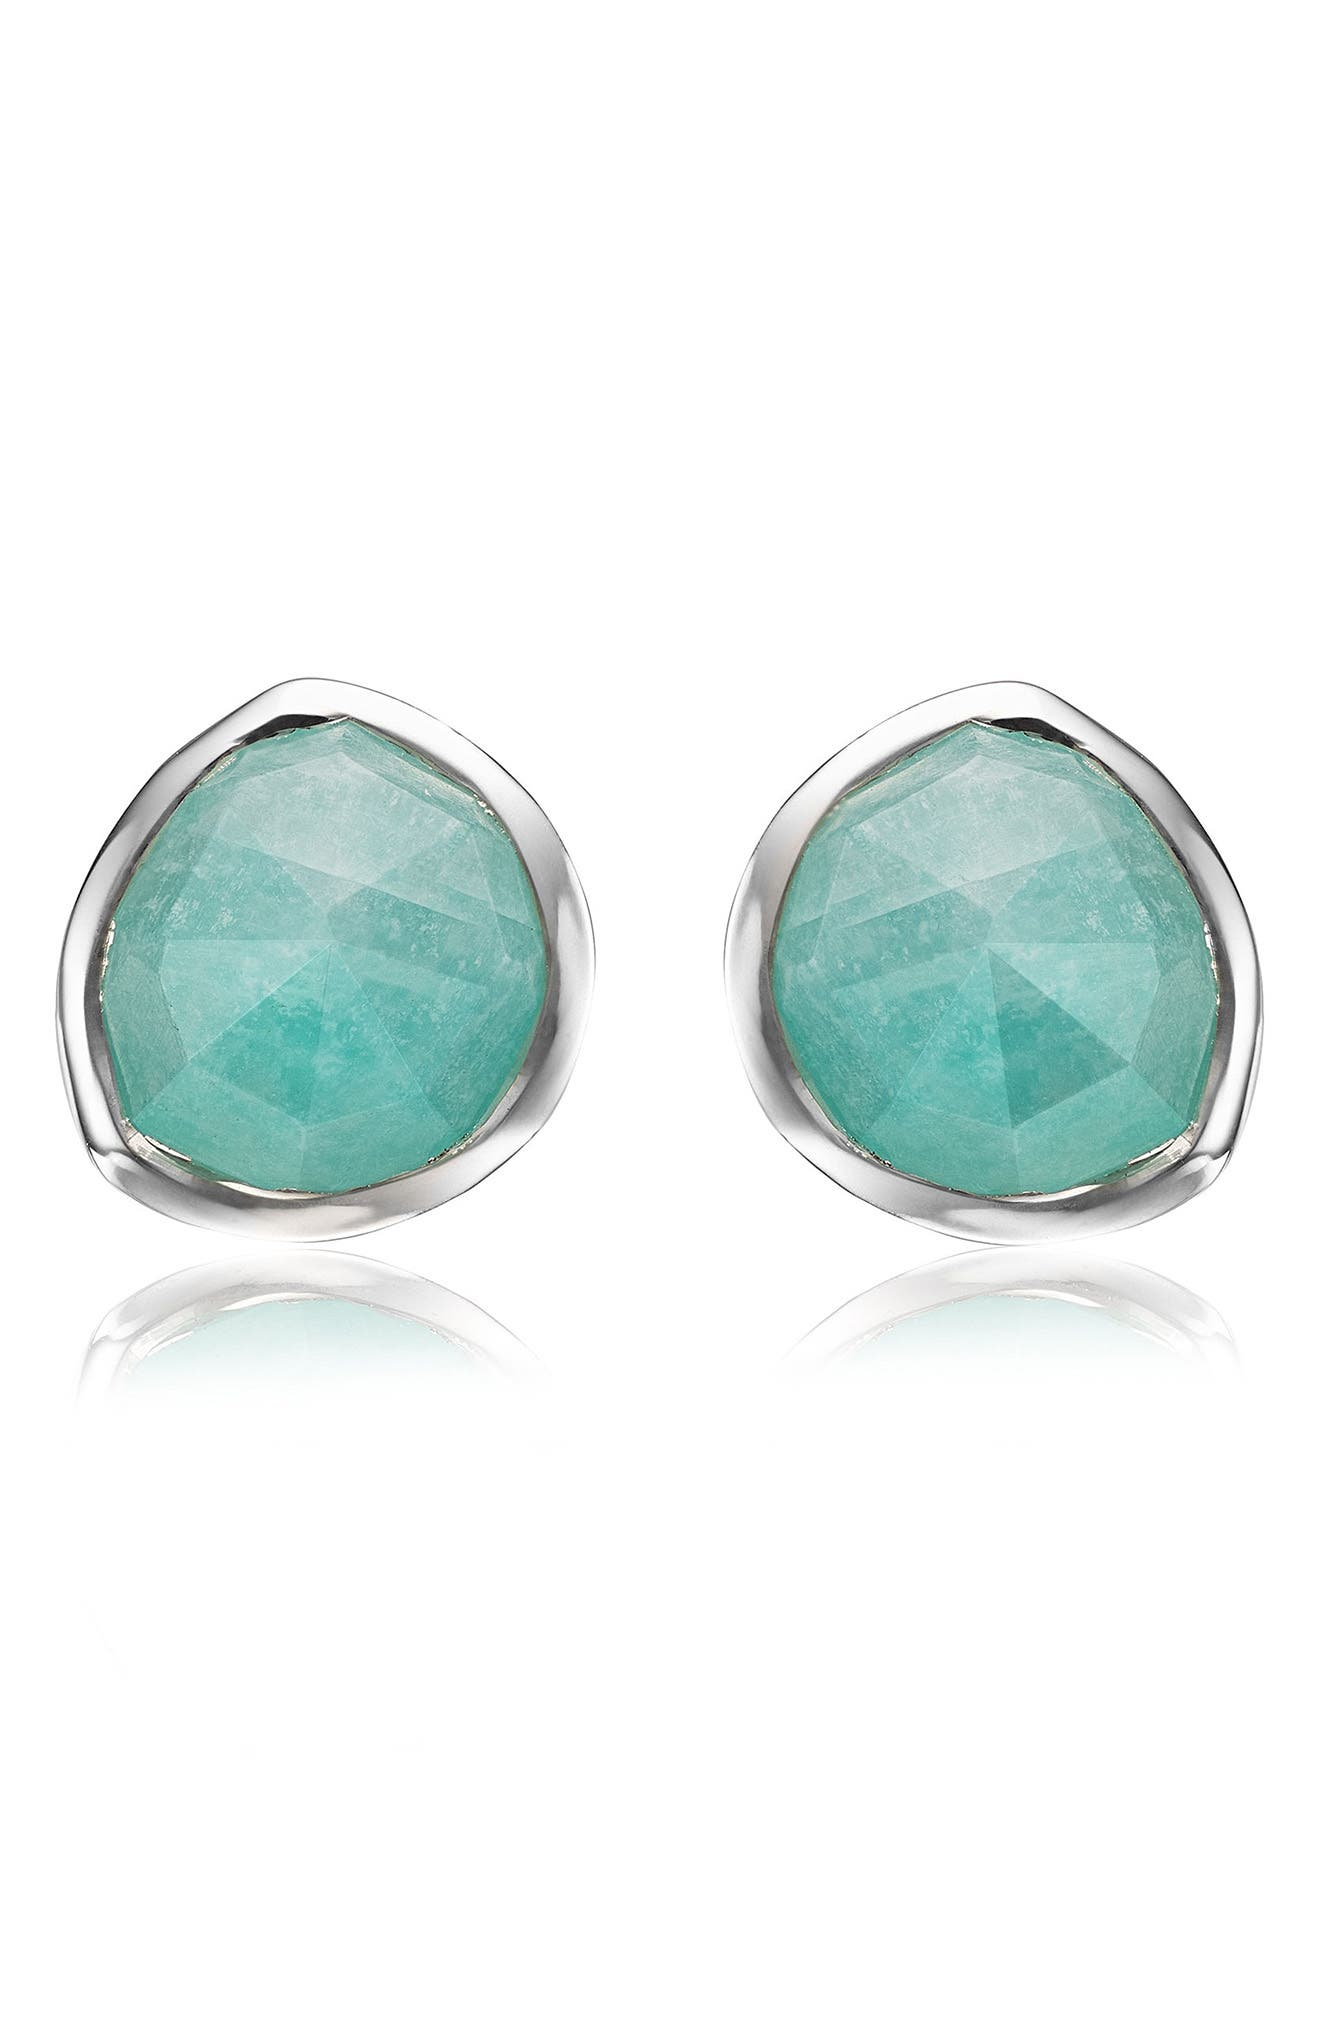 Siren Stud Earrings,                             Main thumbnail 1, color,                             SILVER/ AMAZONITE